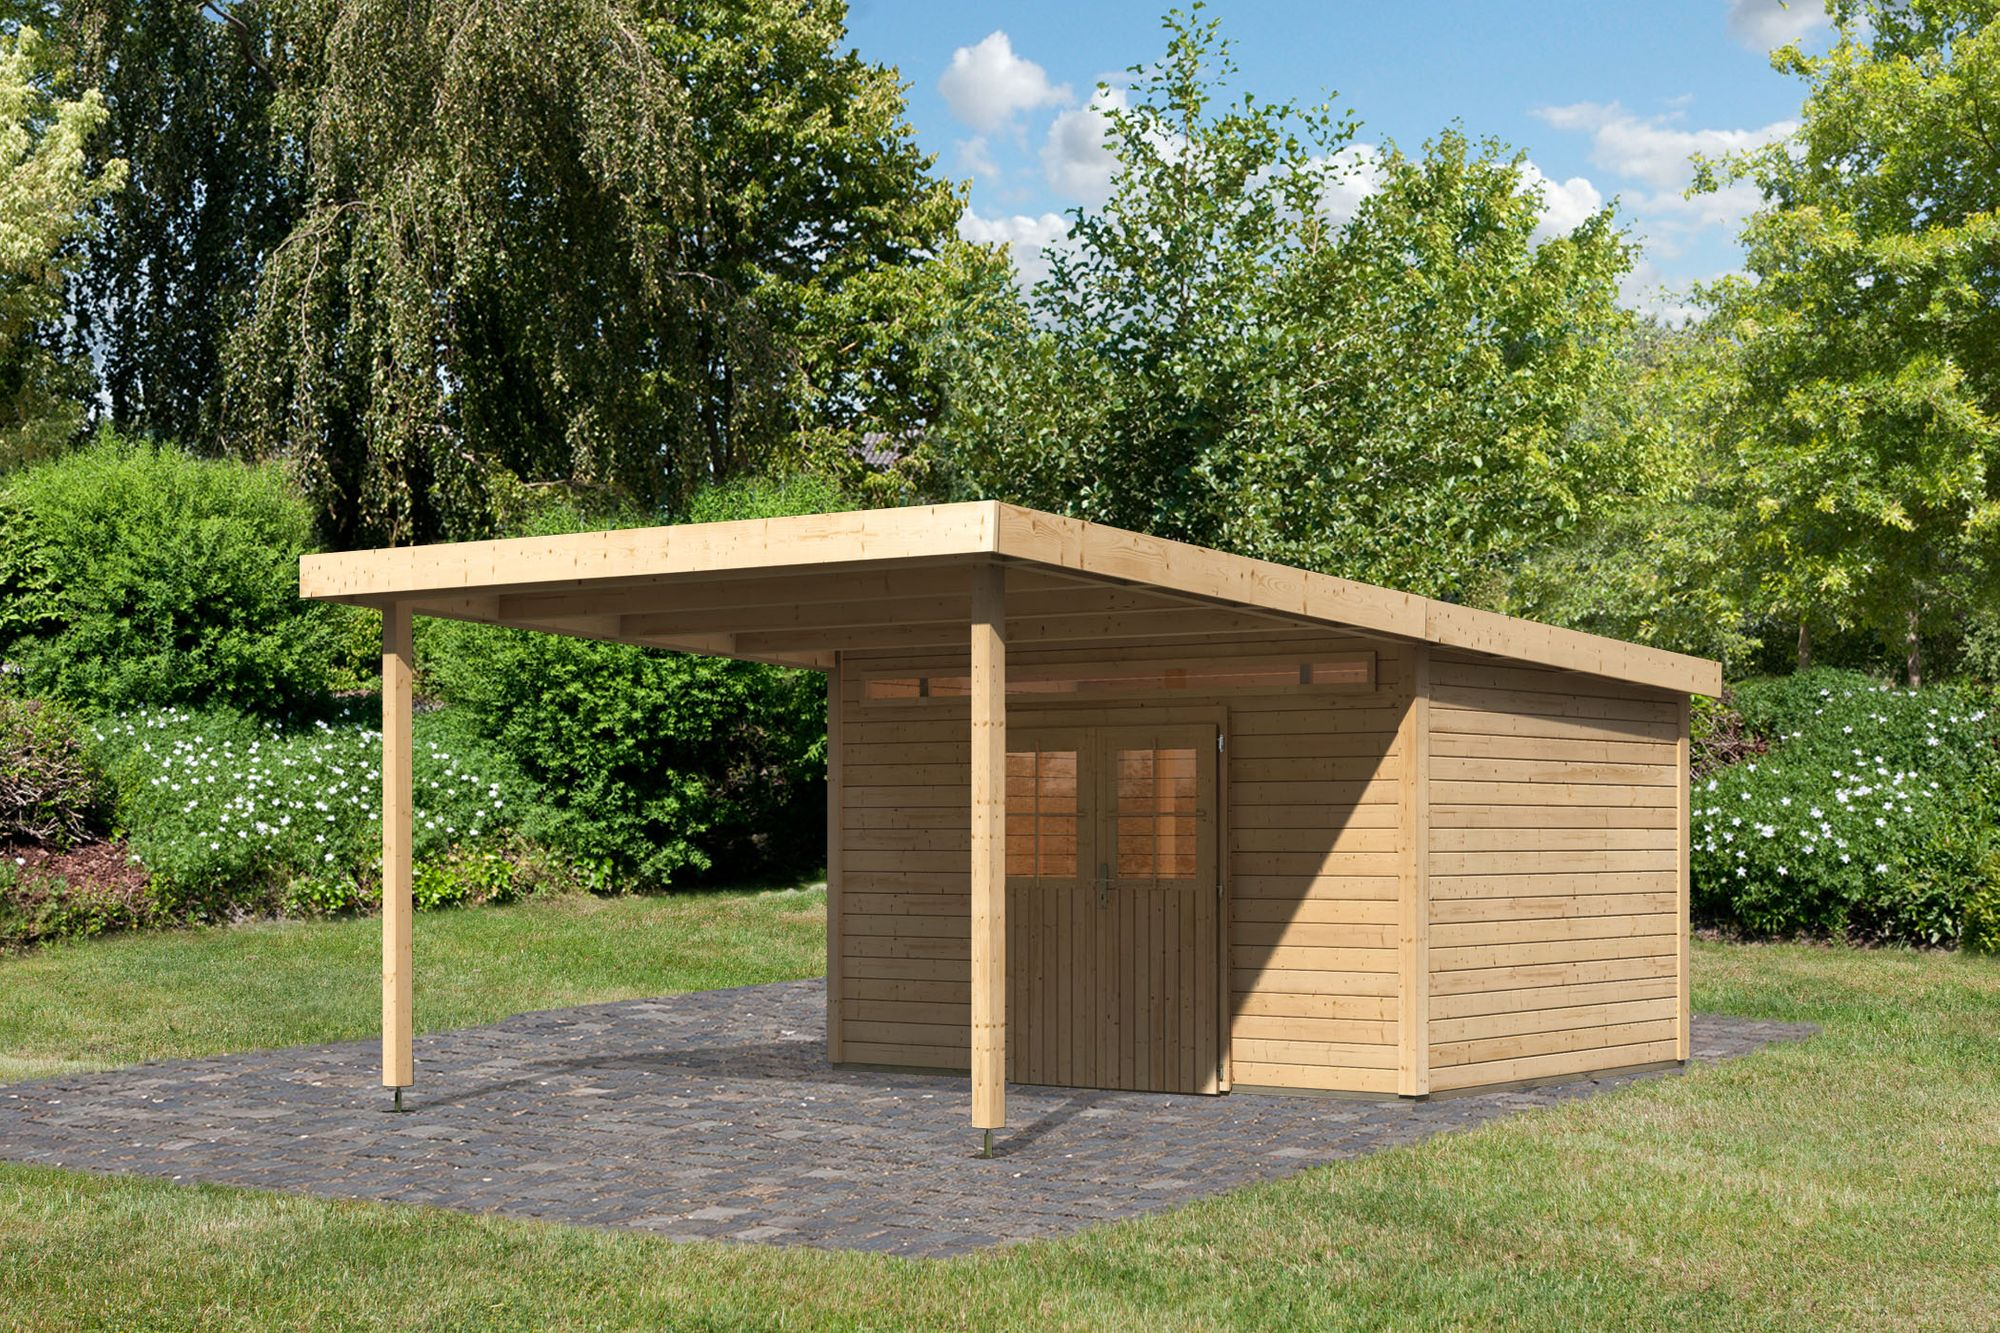 Karibu Holz Gartenhaus Meppen 6 Inkl Vordach 3 2 M Farbe Naturbelassen